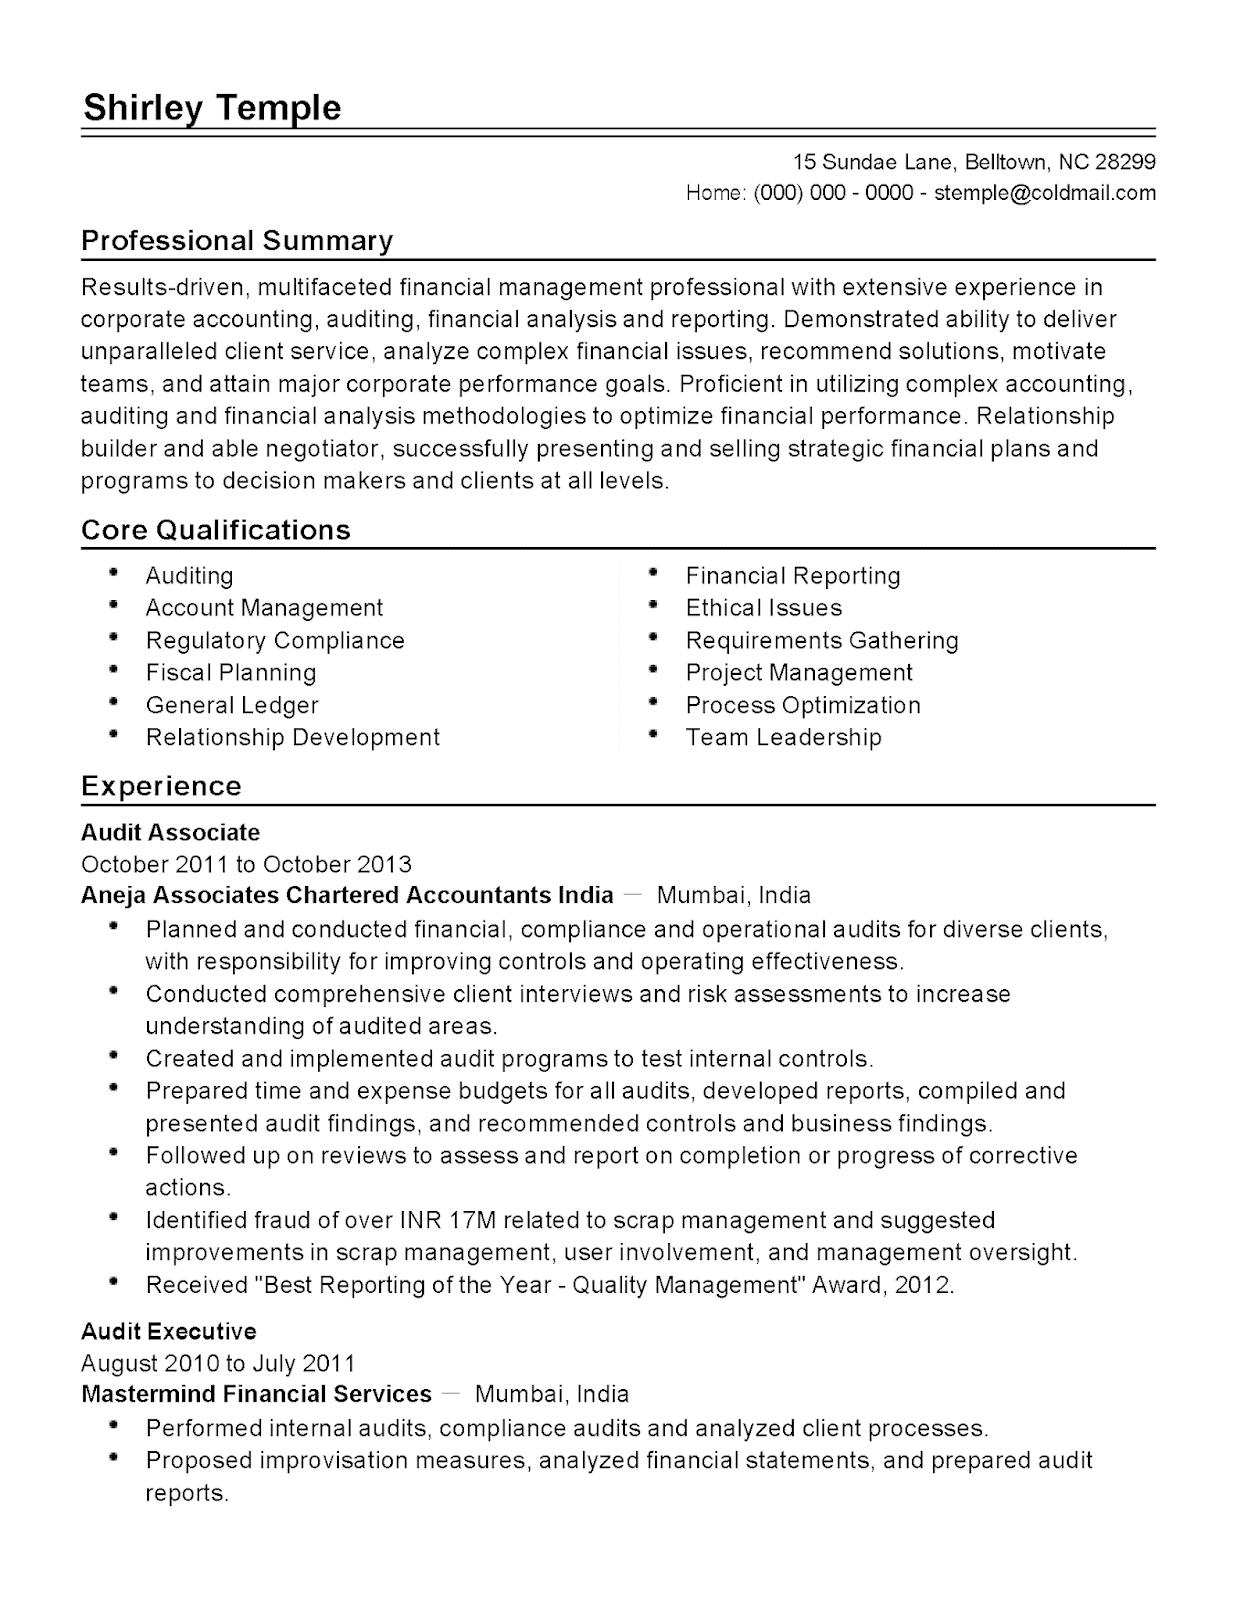 Pwcglobal com resume best career objective lines for resume